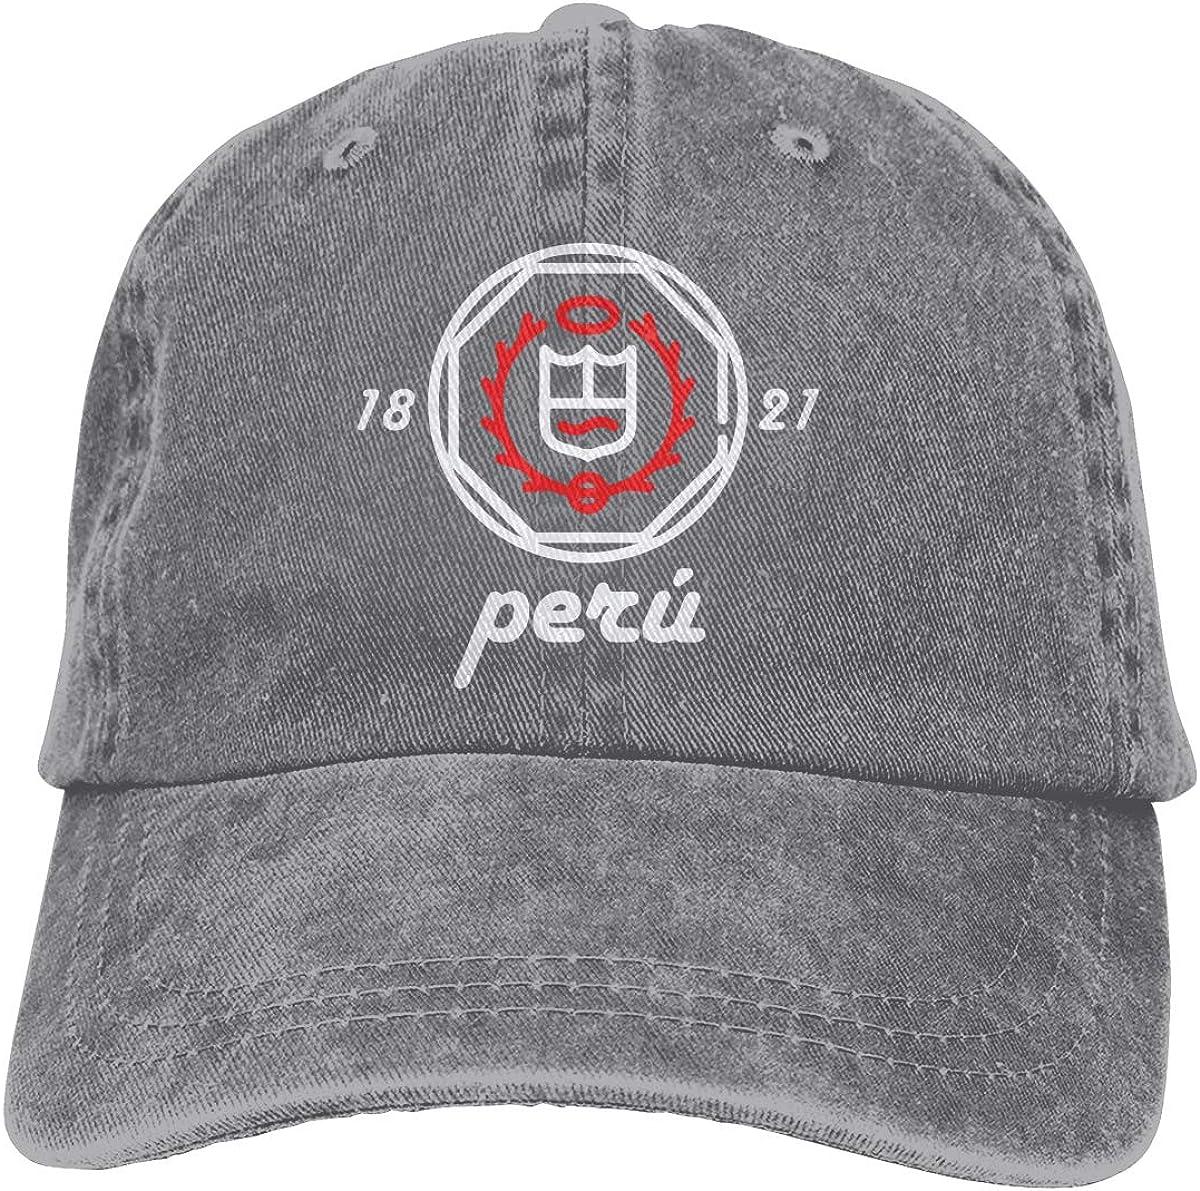 PMGM-C White Peruvian Shield Unisex Trendy Jeans Casquette Adjustable Baseball Cap